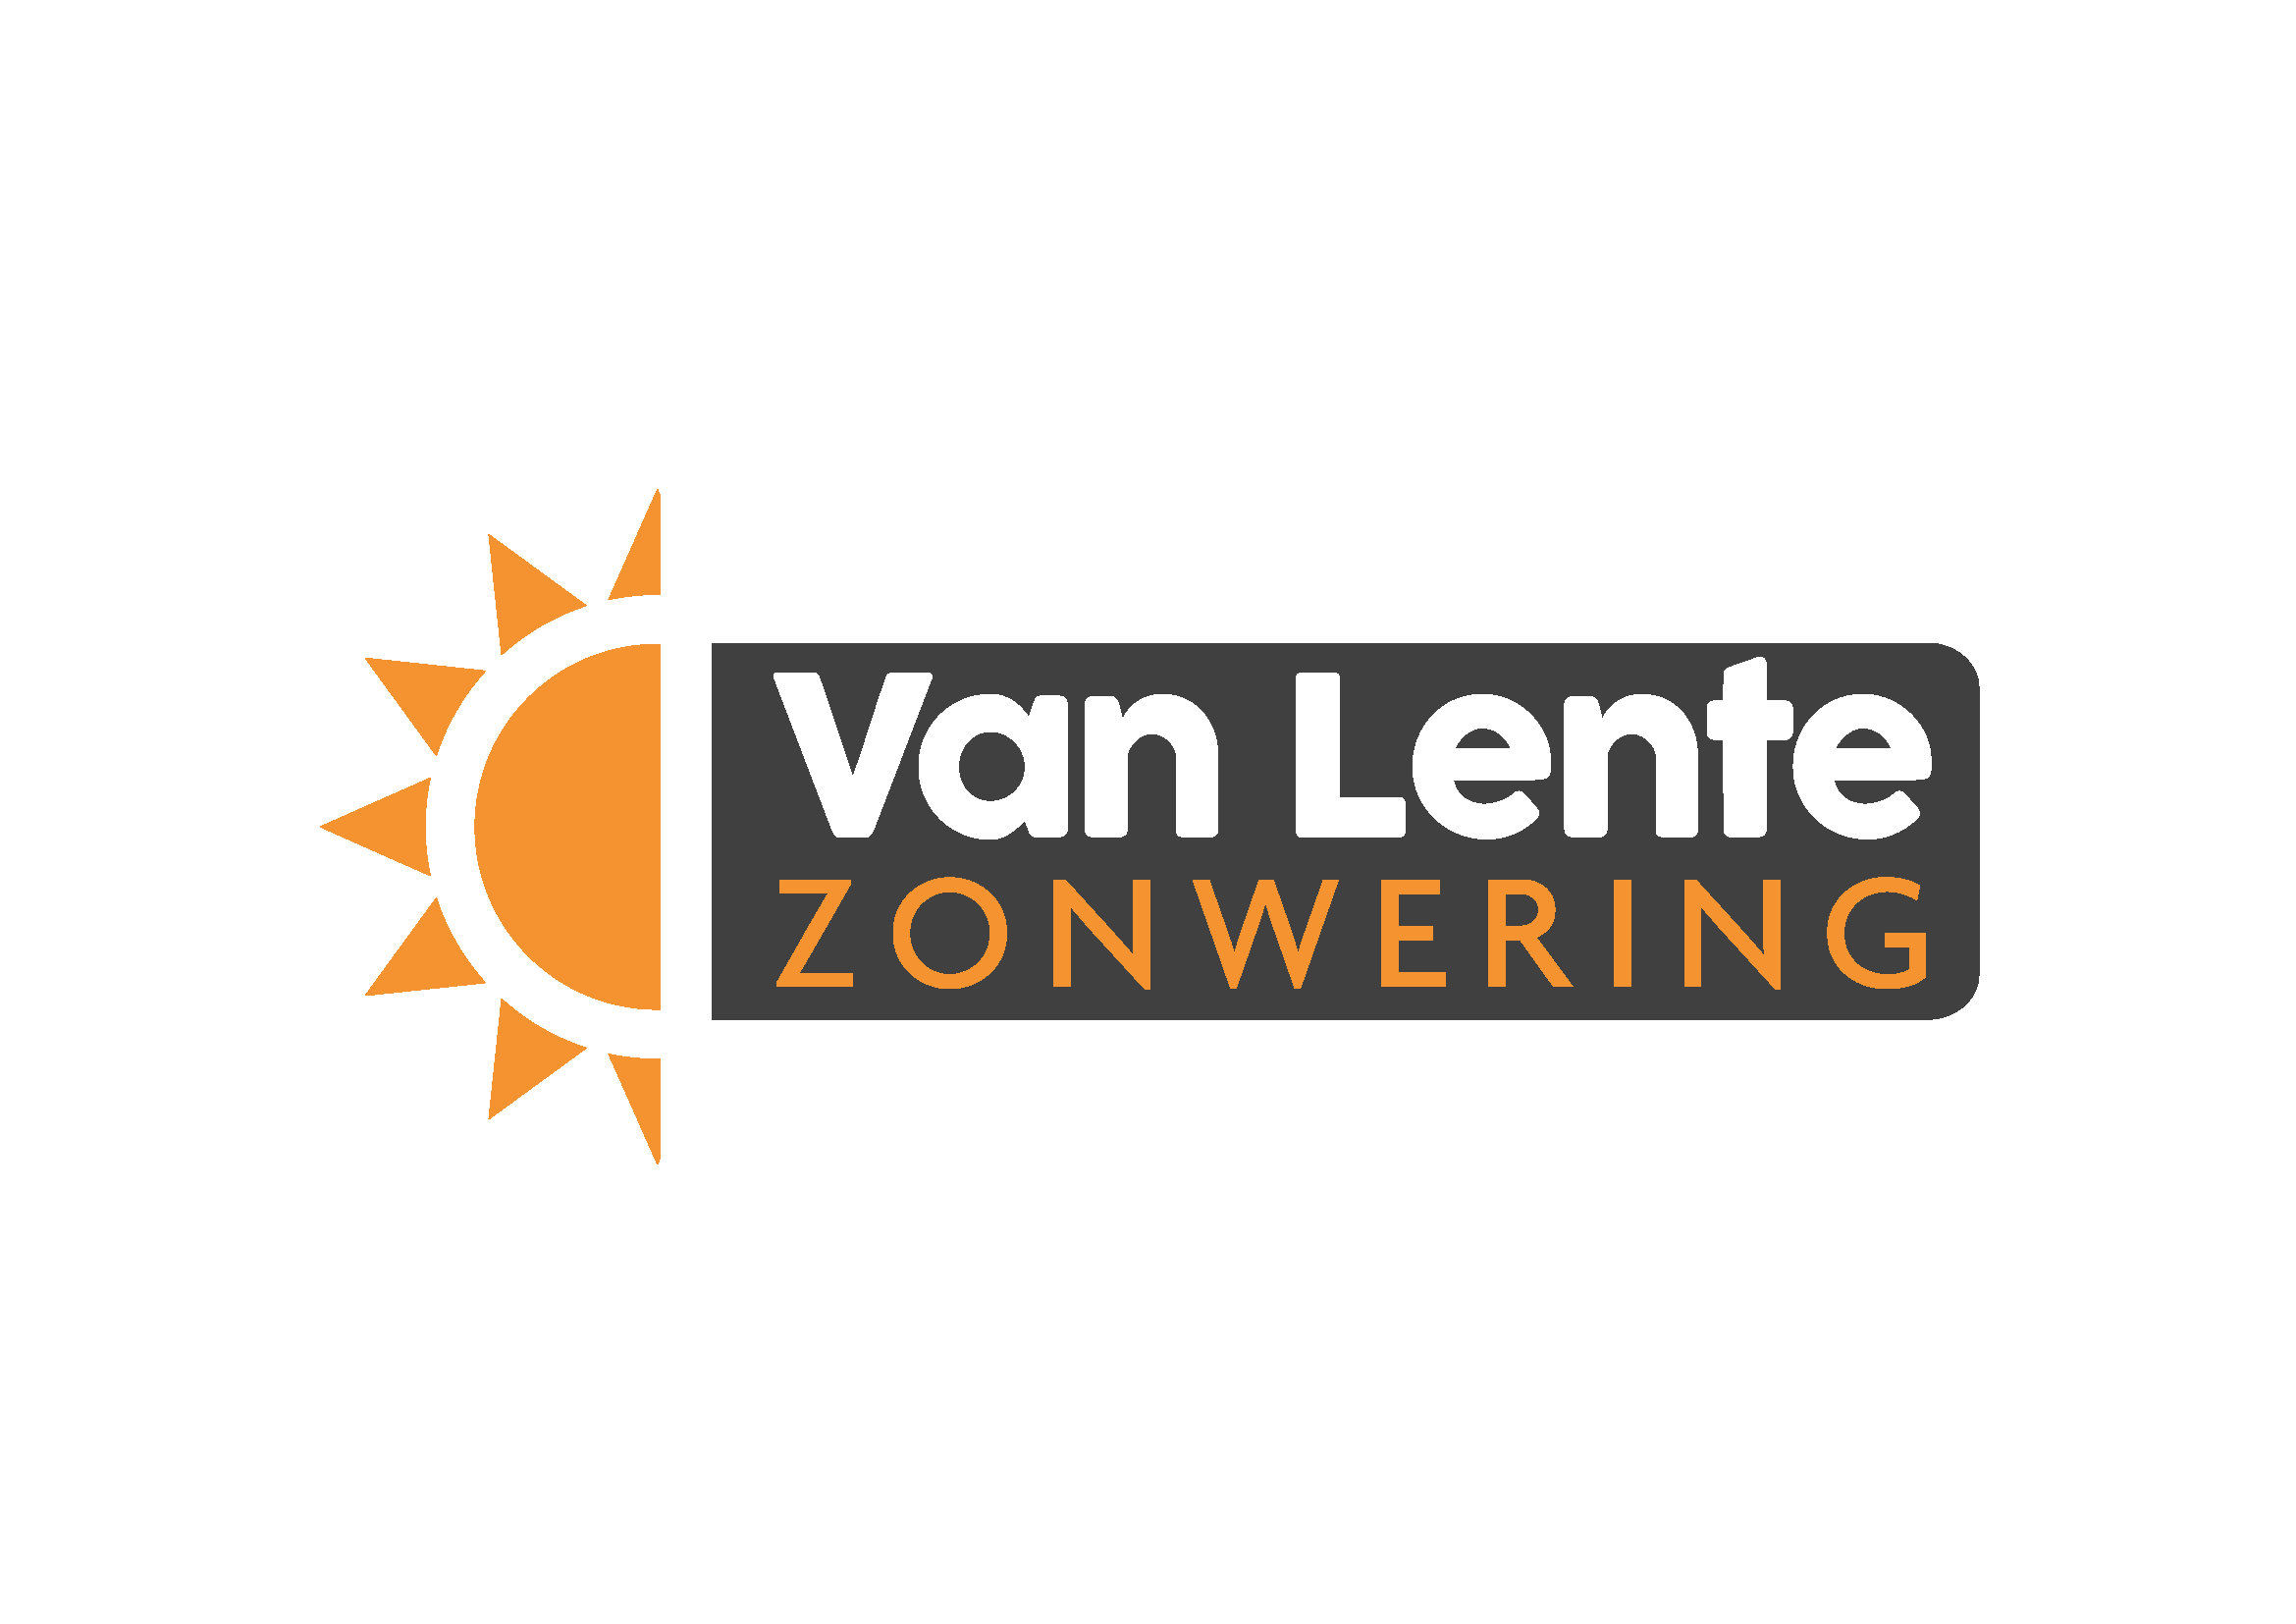 11 vanLenteZonwering - logo